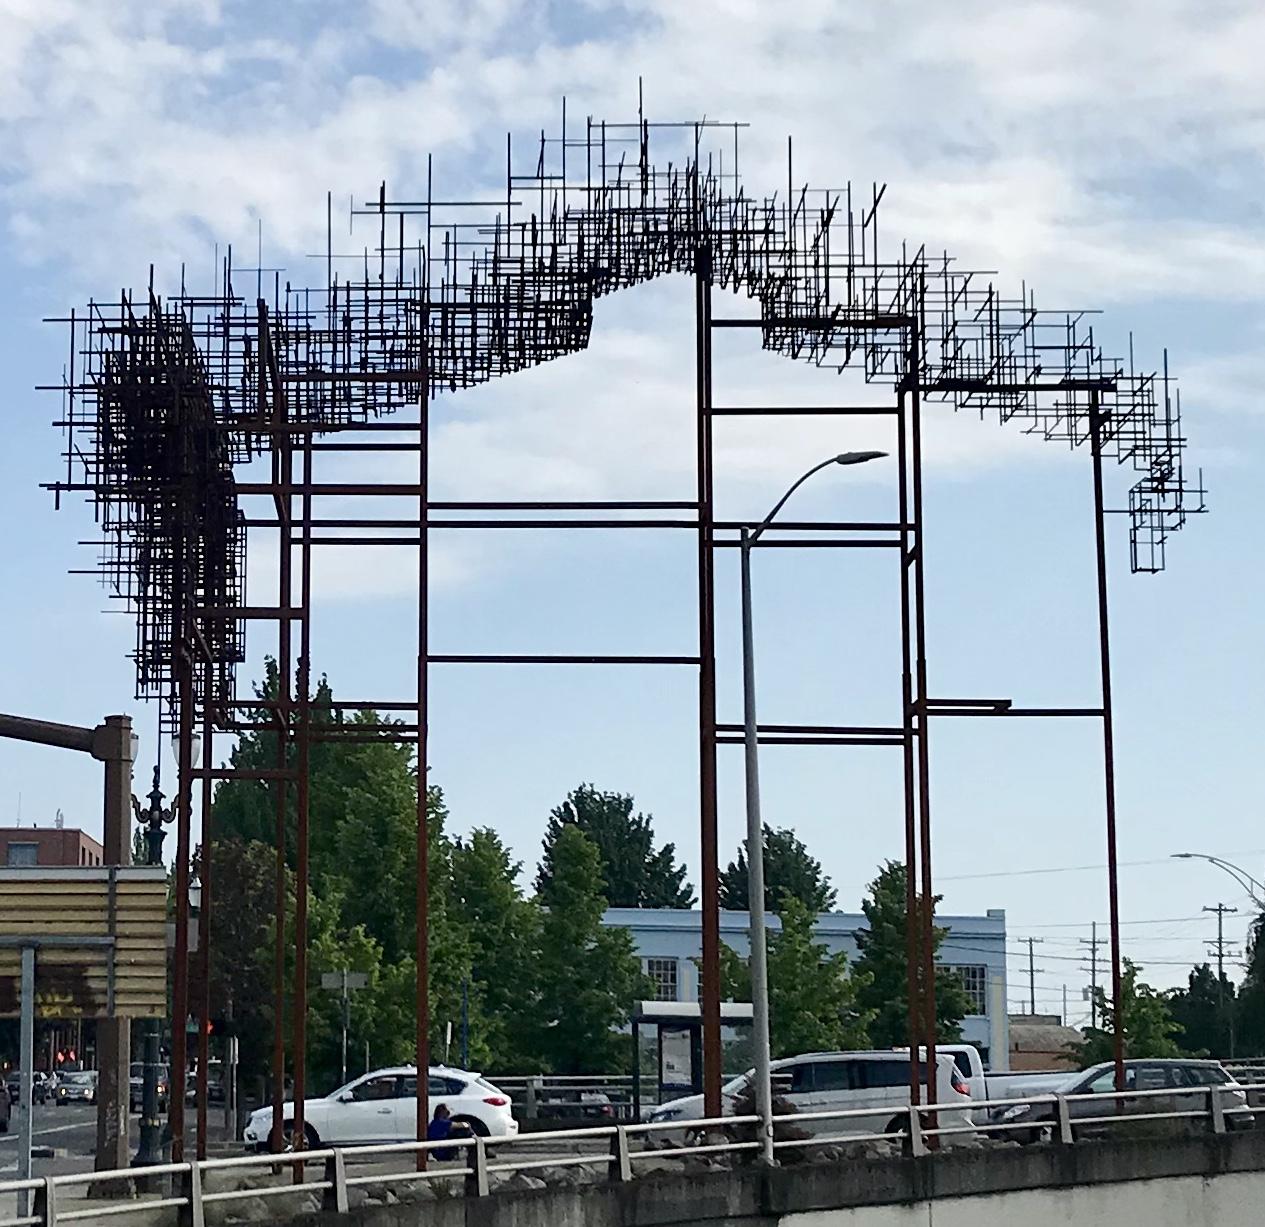 Art installation in SE Portland